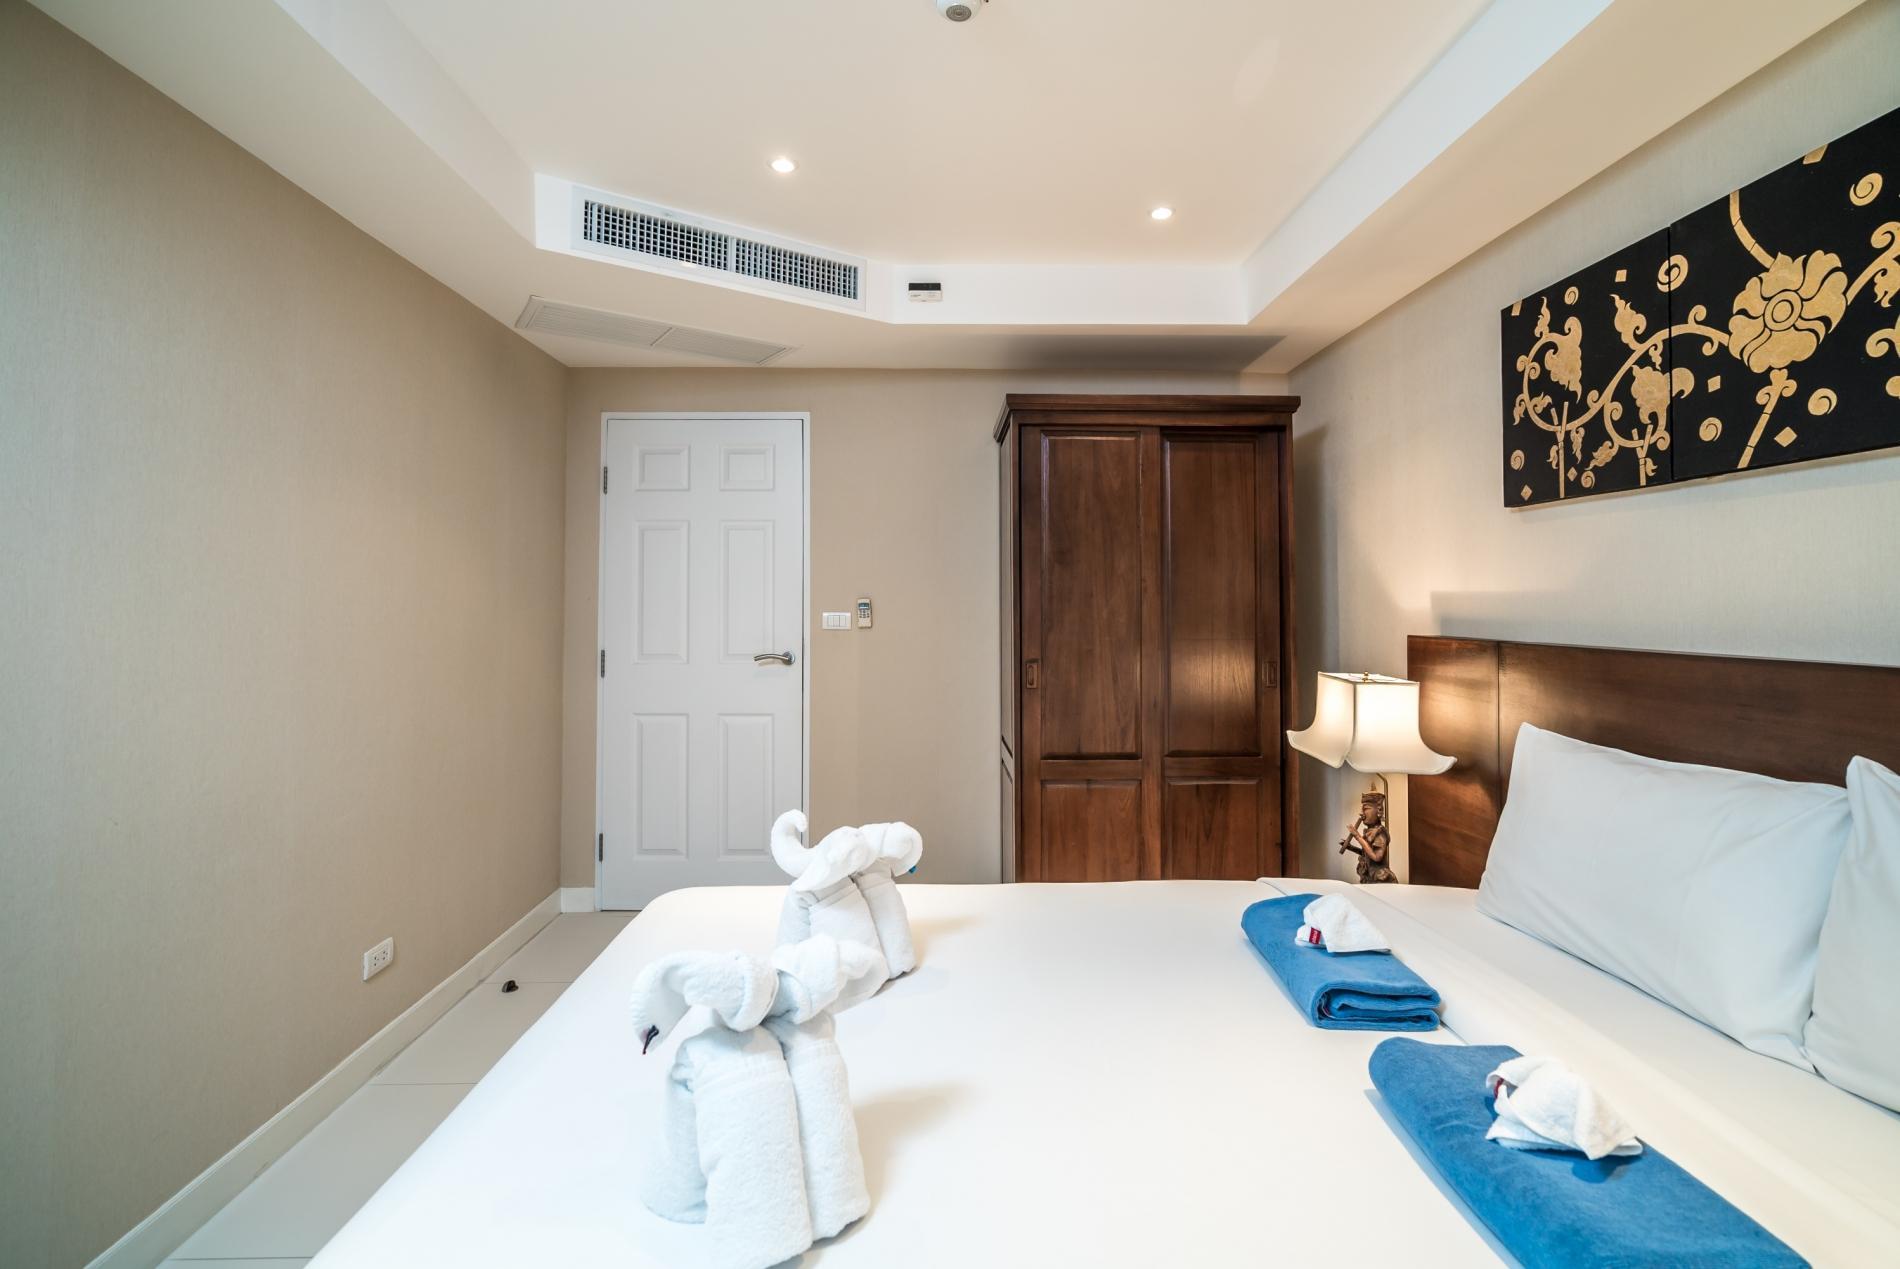 Apartment Kata Ocean View condominium - 1 bdr mountain view apartment photo 20177673